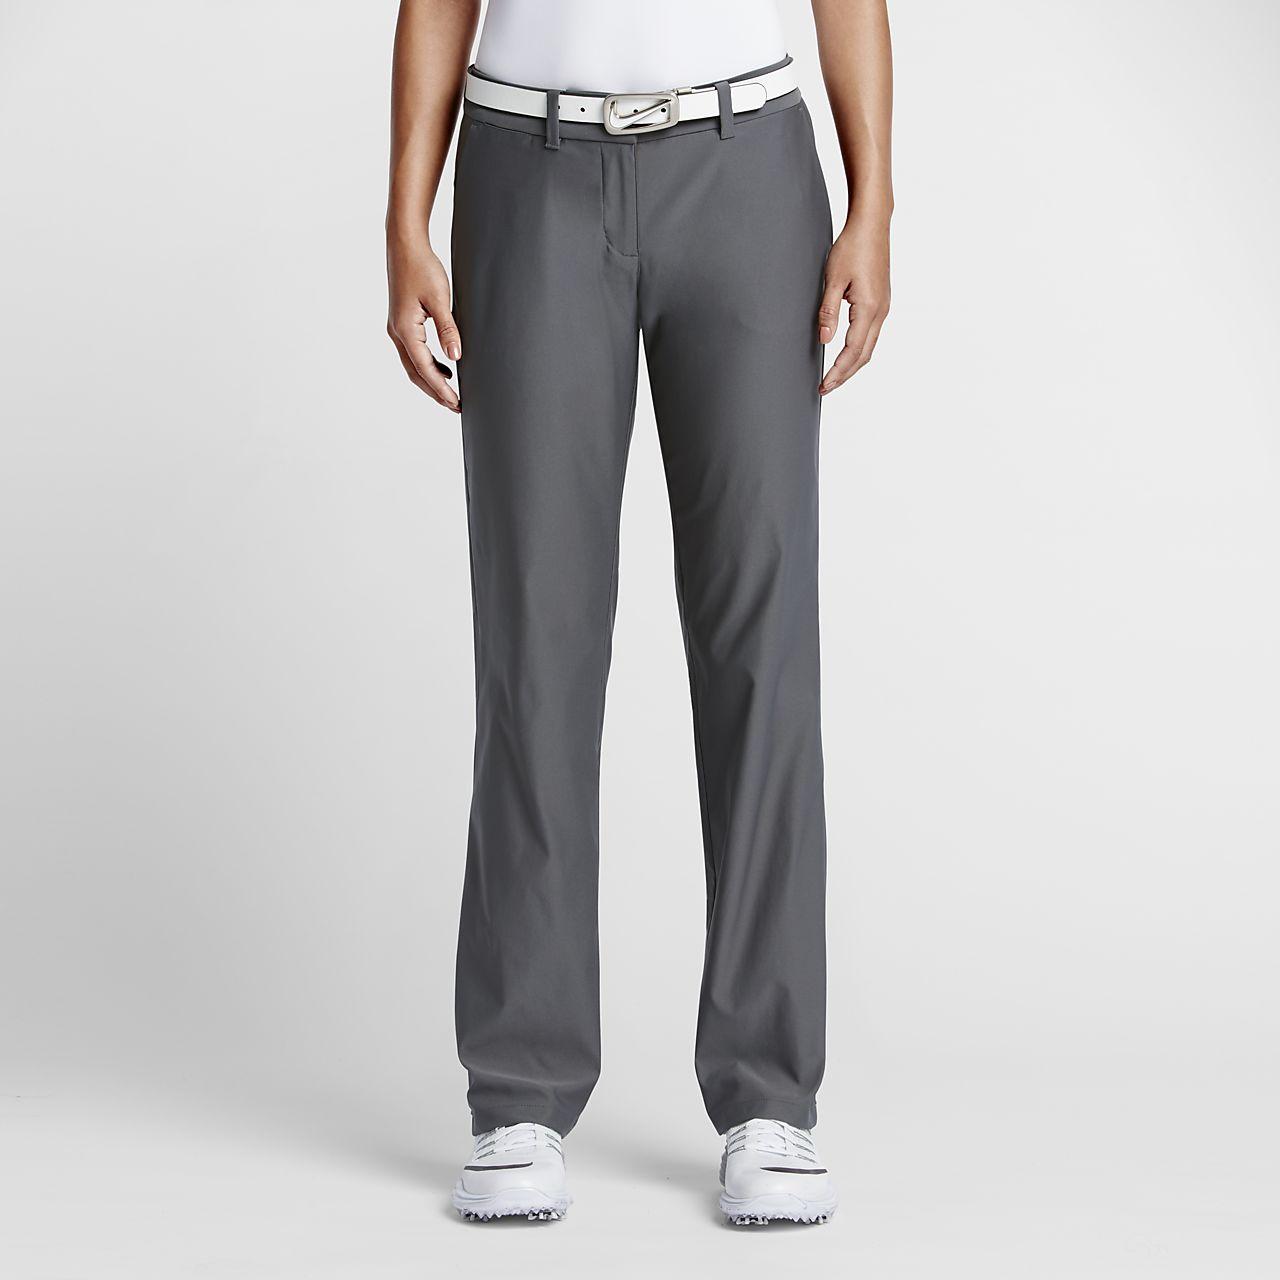 Pantalones de golf para mujer Nike Dry